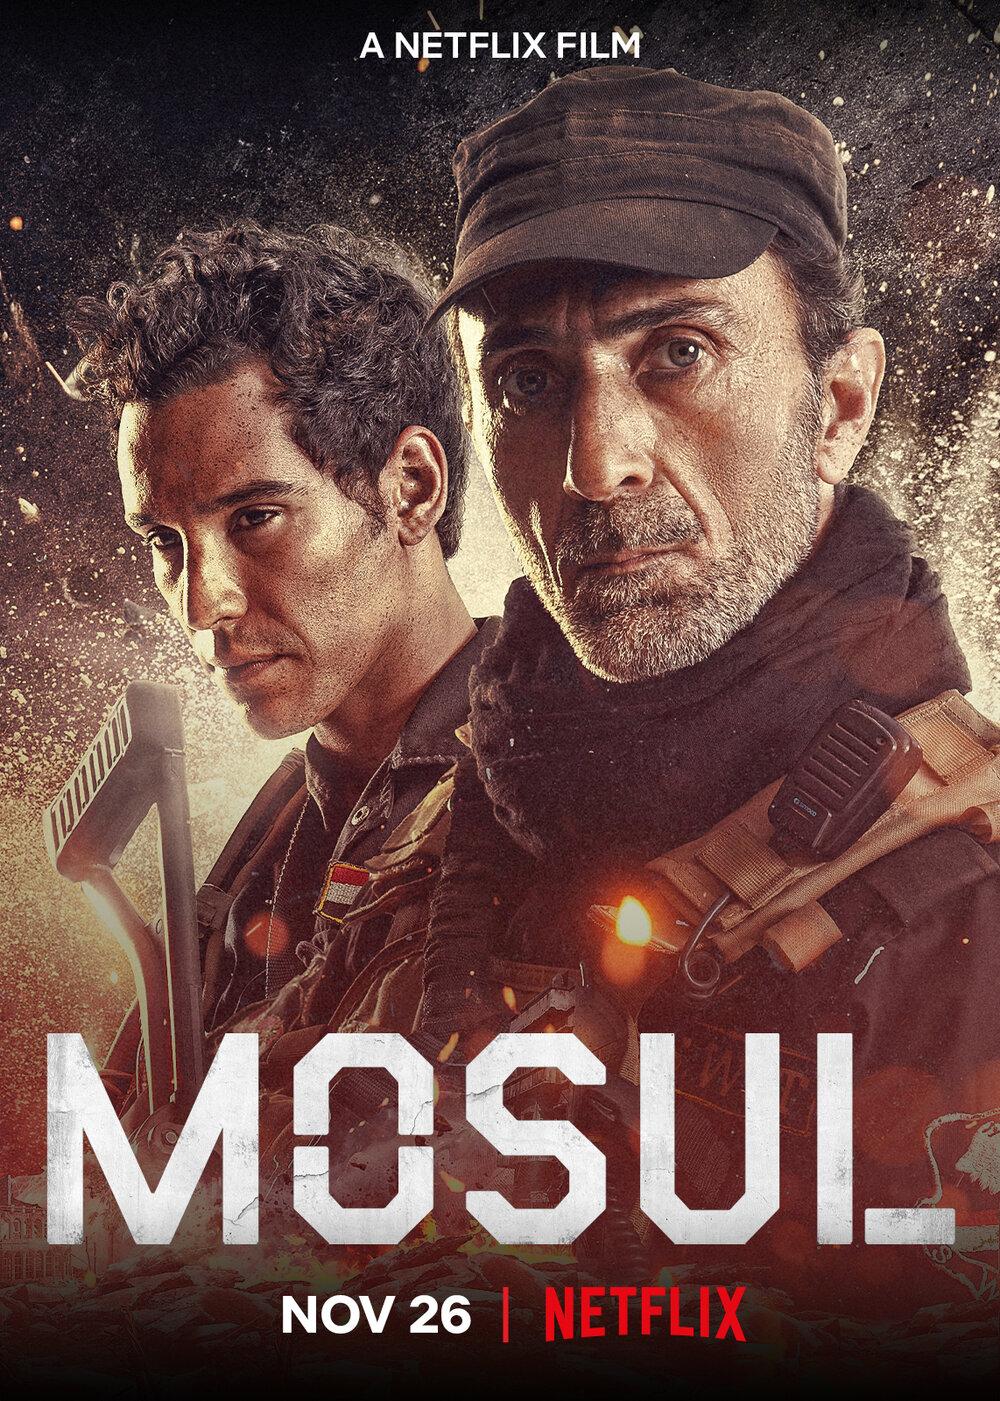 Mosul Netflix Poster